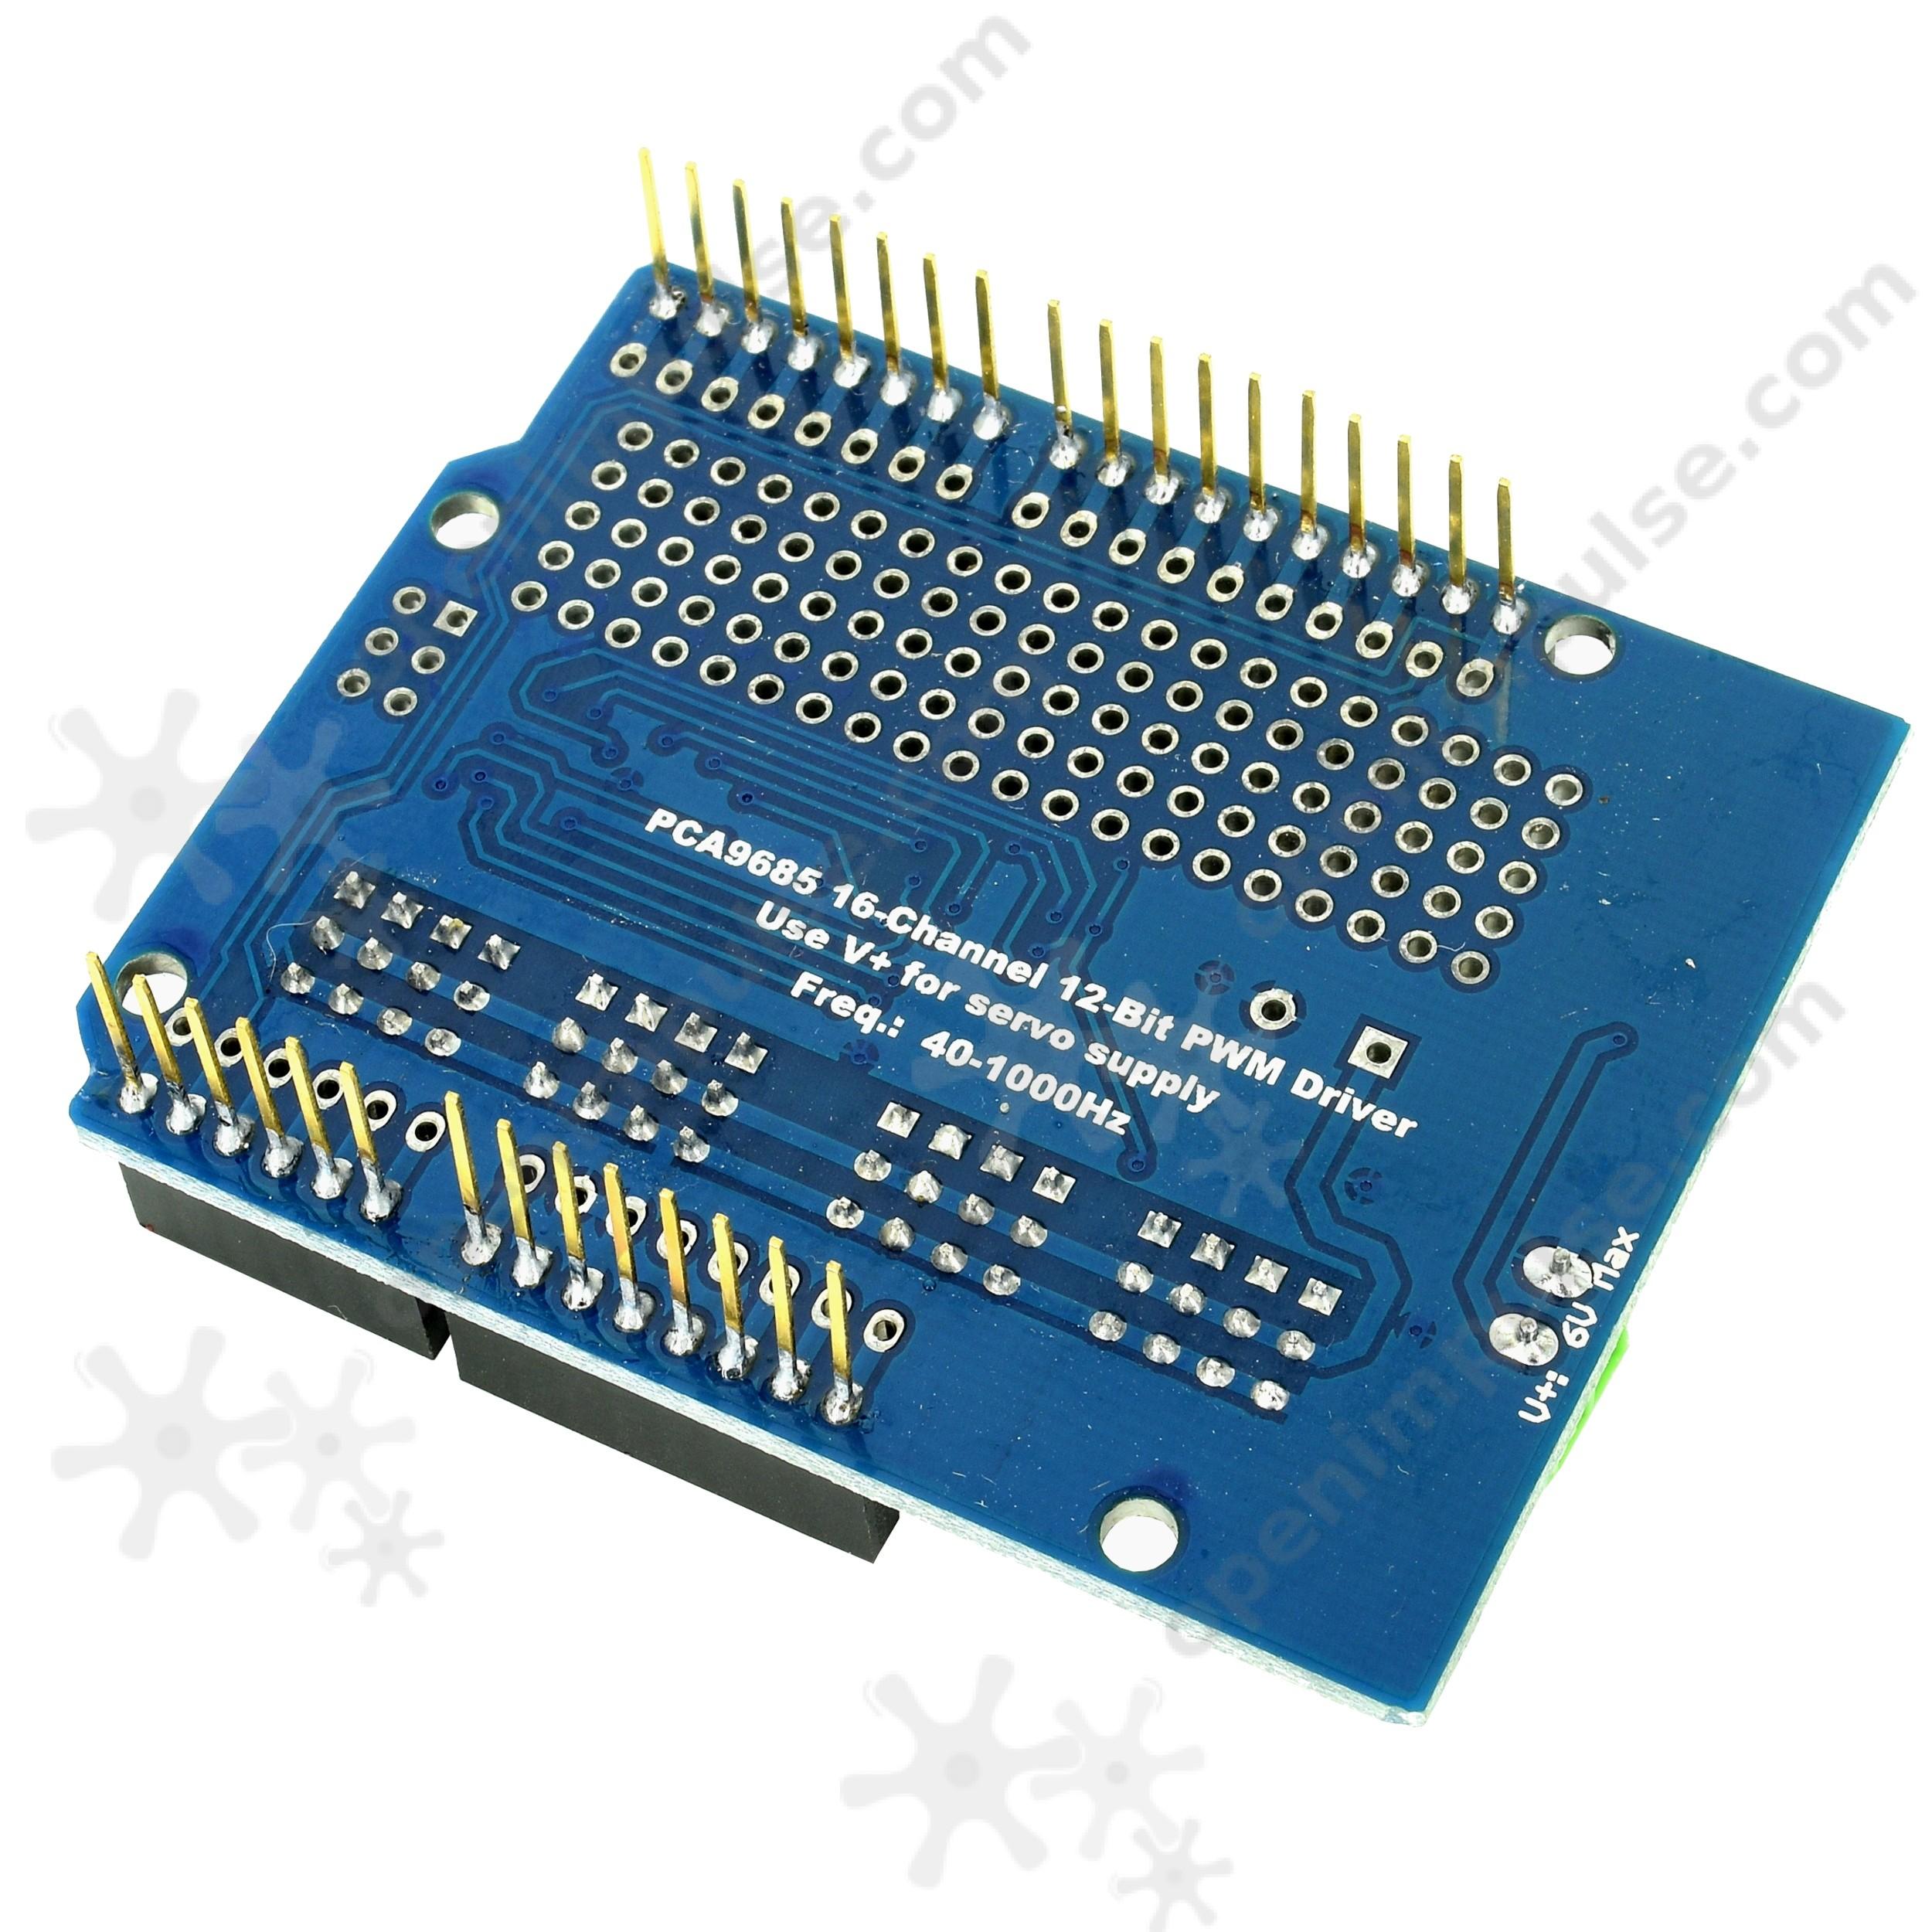 Oh Pca9685 16 Channel 12 Bit Pwm Servo Motor Driver I2c Module For Circuithelp Arduino Micro 1 3